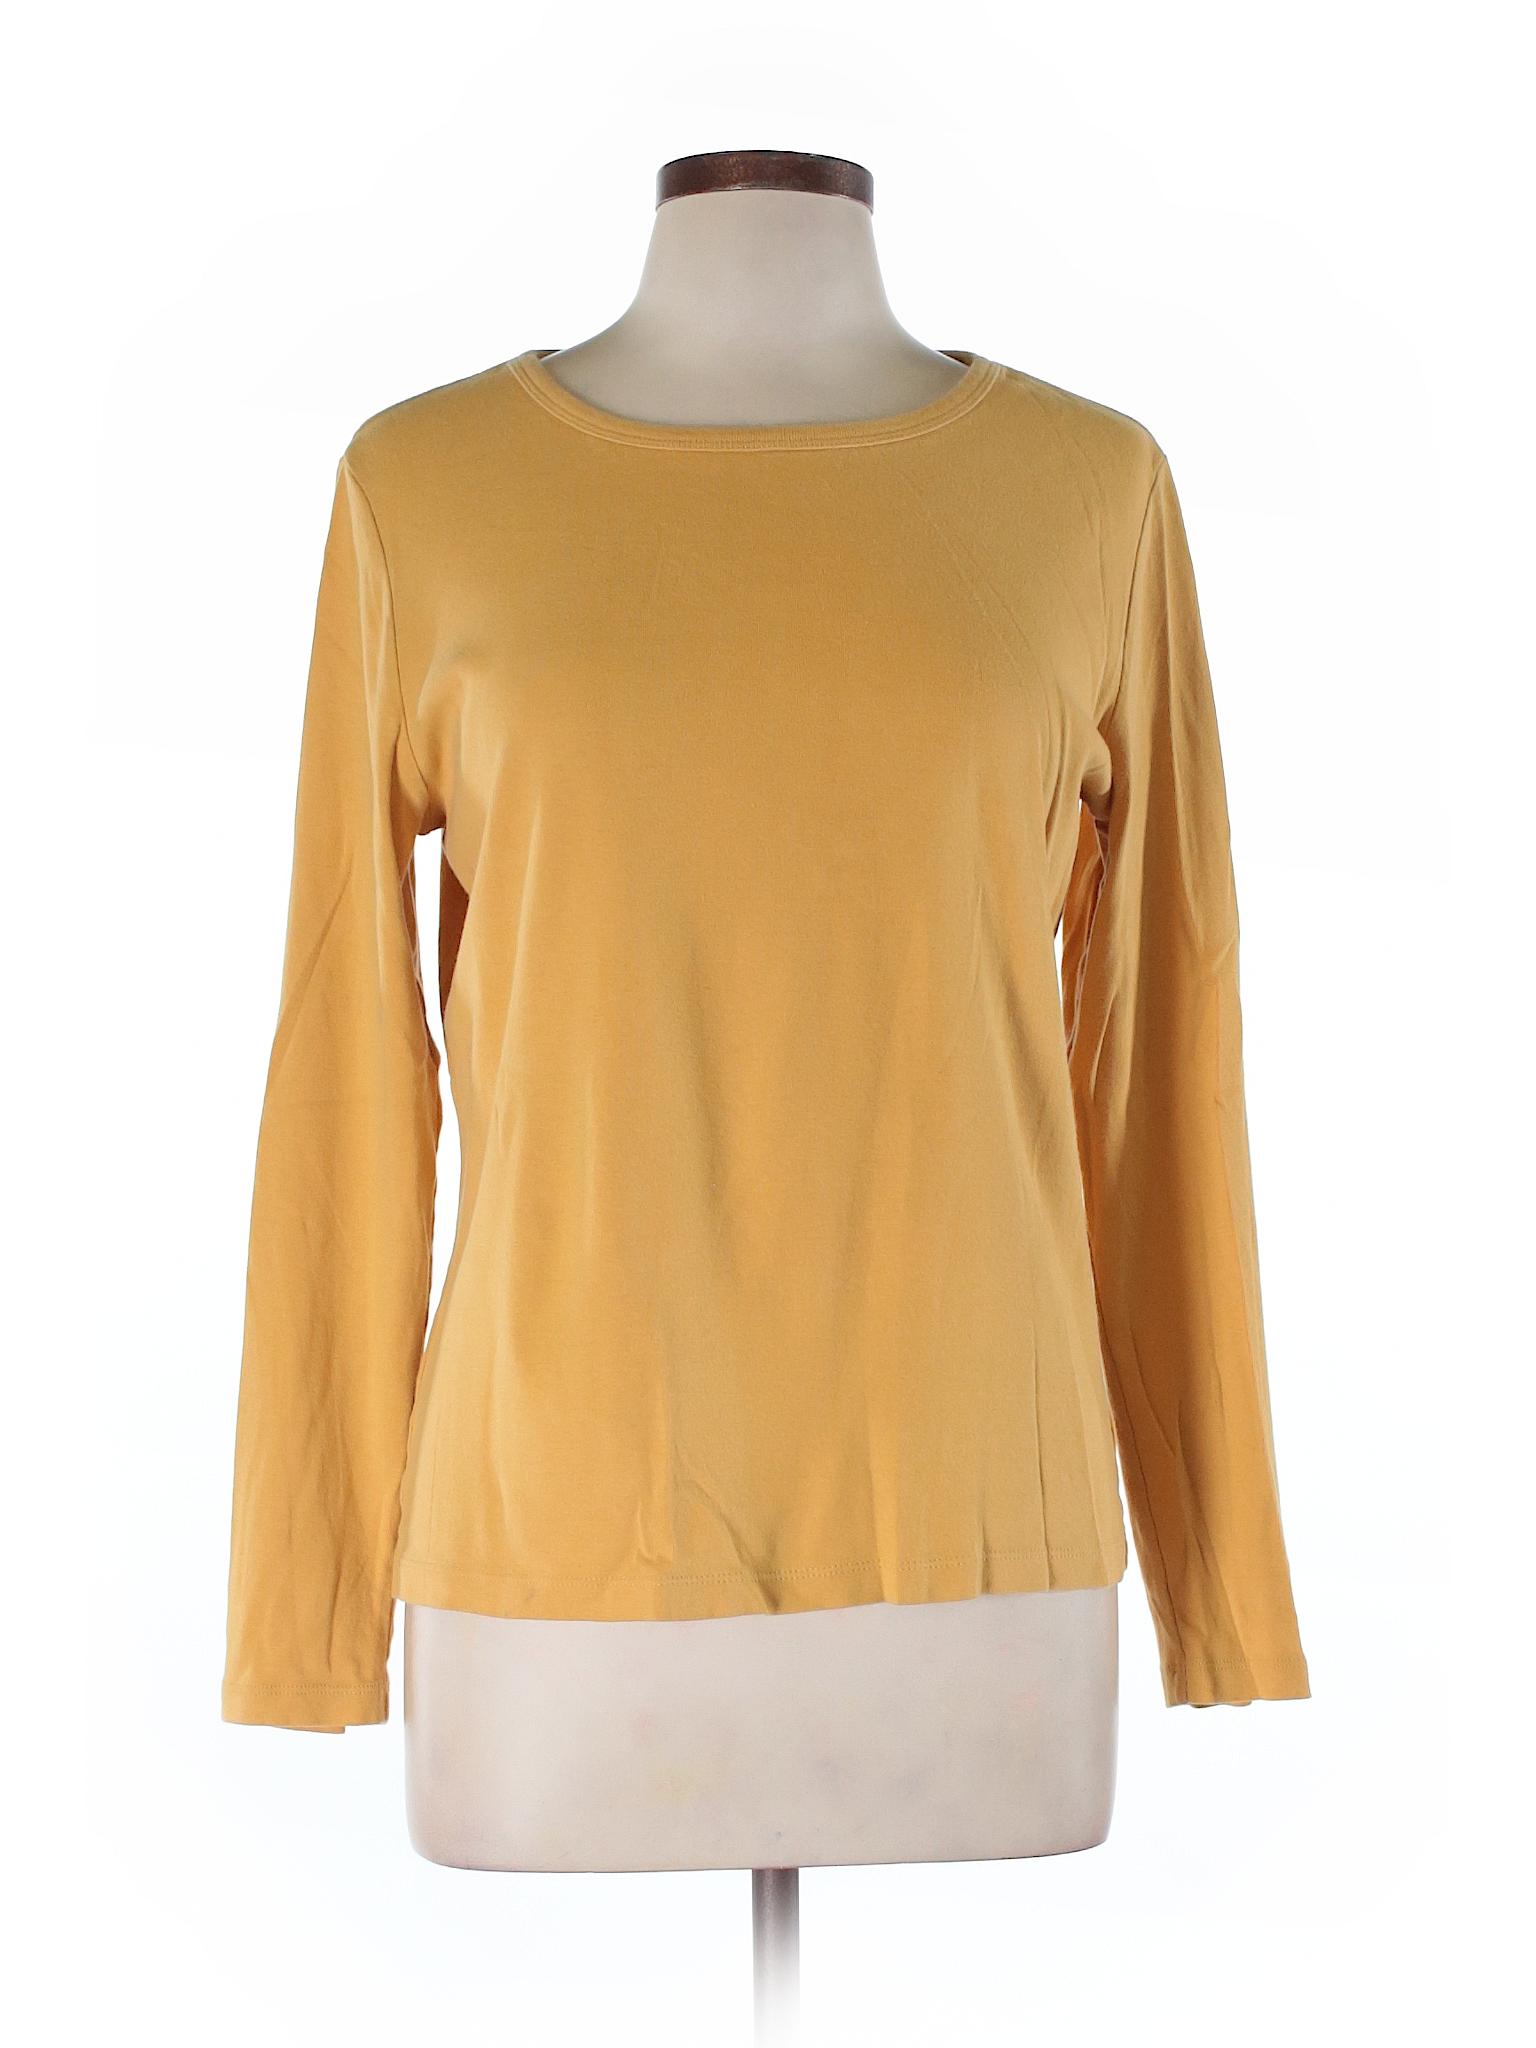 St John 39 S Bay Long Sleeve T Shirt 80 Off Only On Thredup